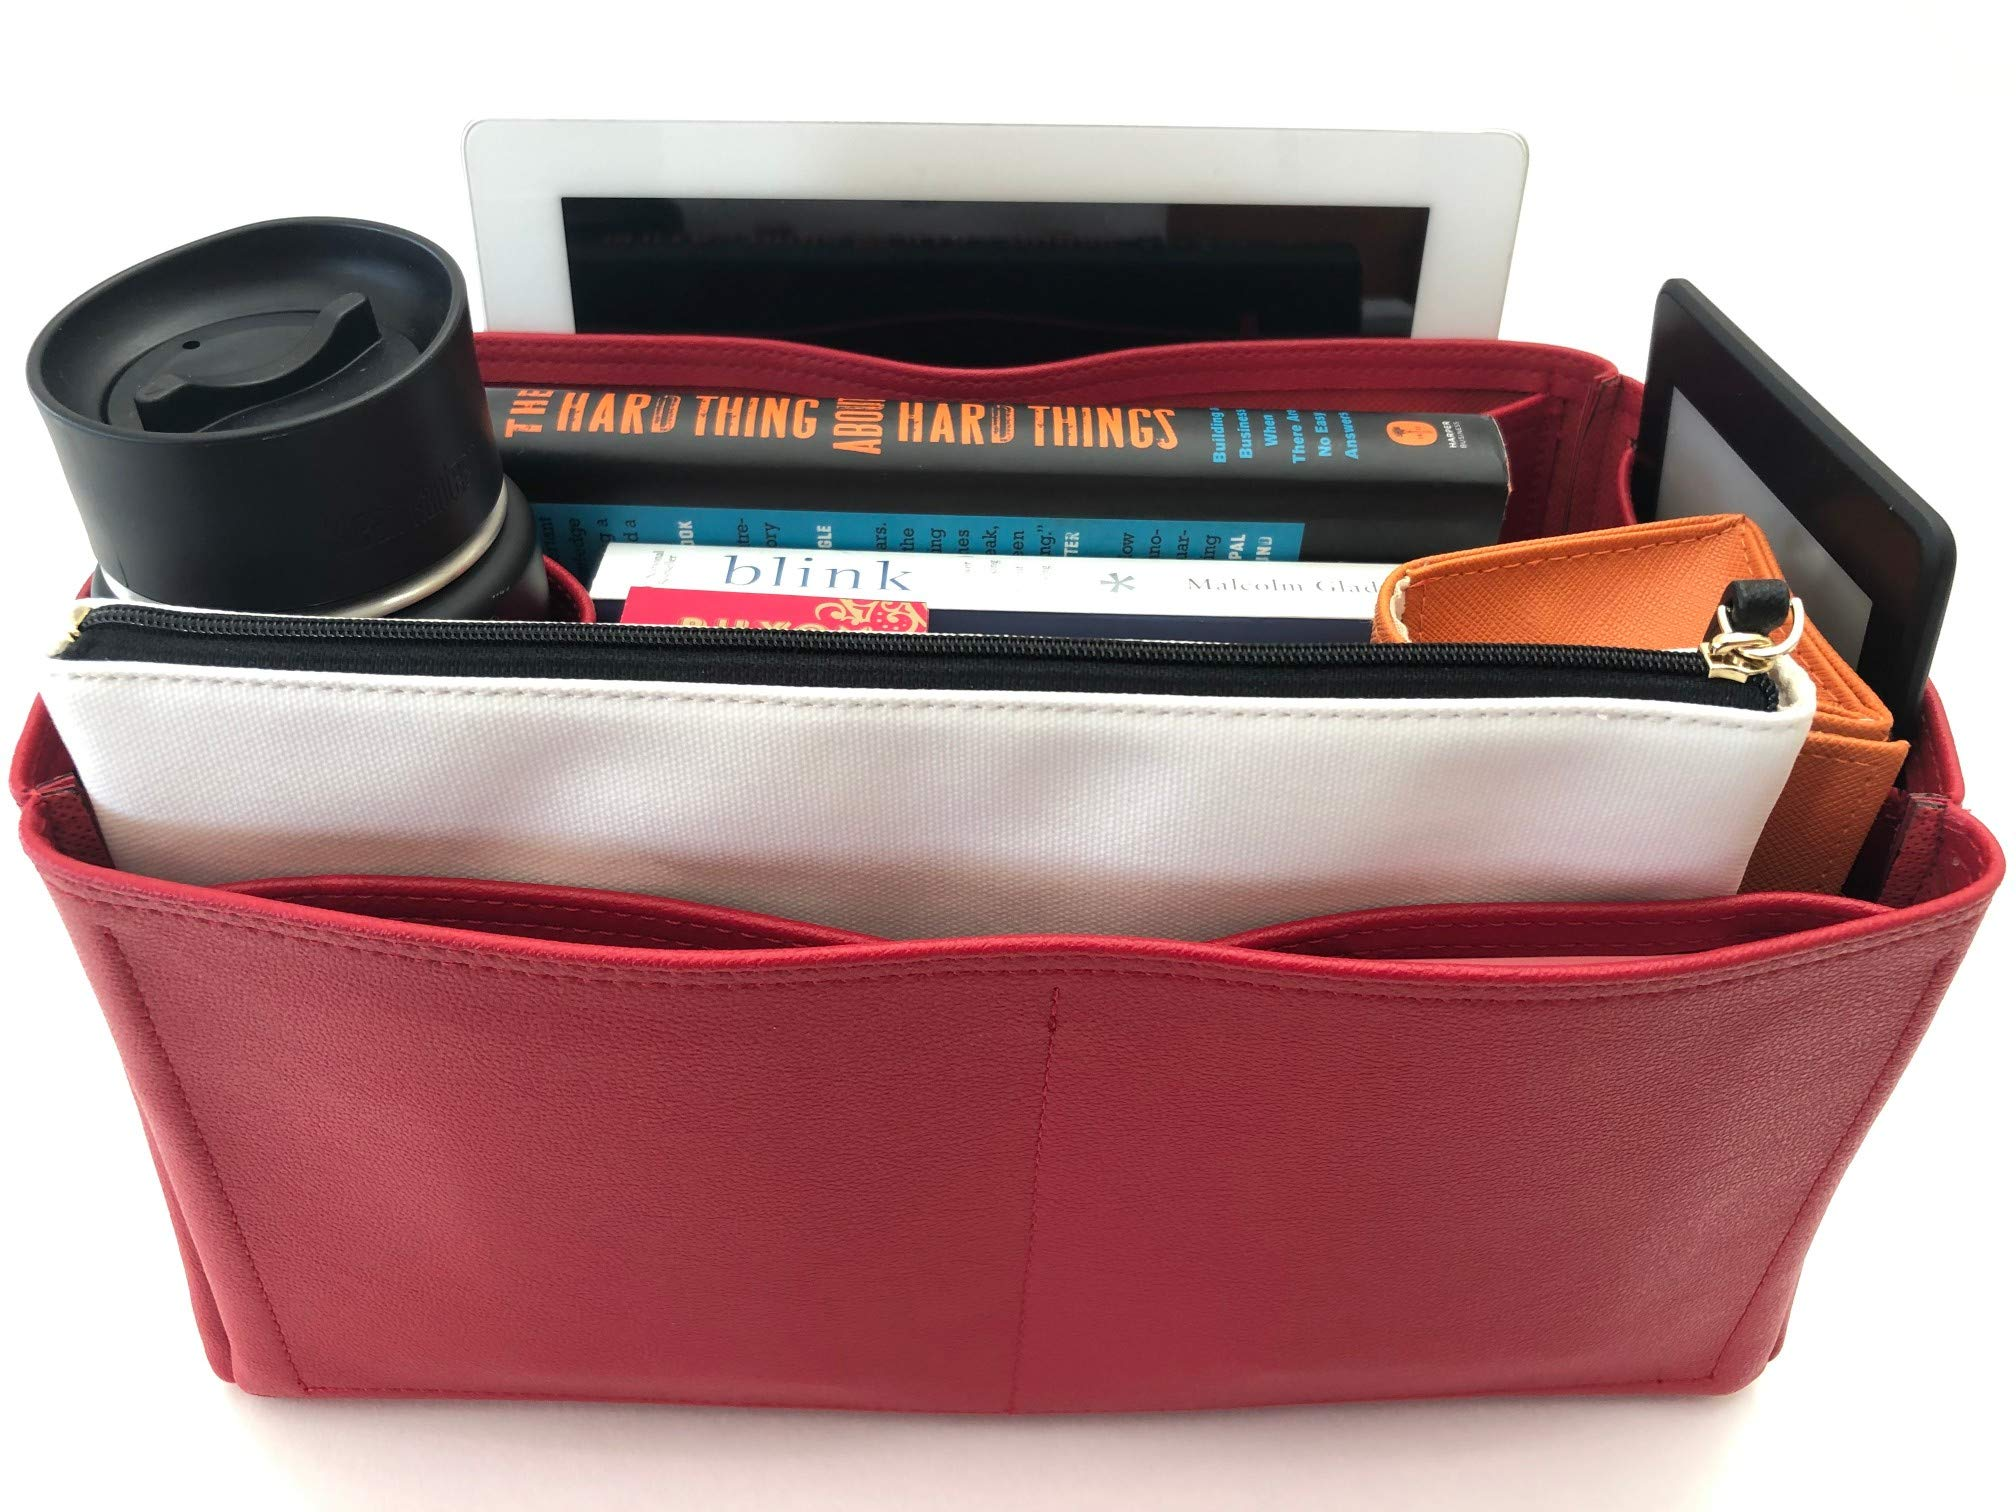 Purse Organizer Insert for LV Graceful Handbag - Fits inside Louis Vuitton Graceful MM bag - Vegan Leather (Red)